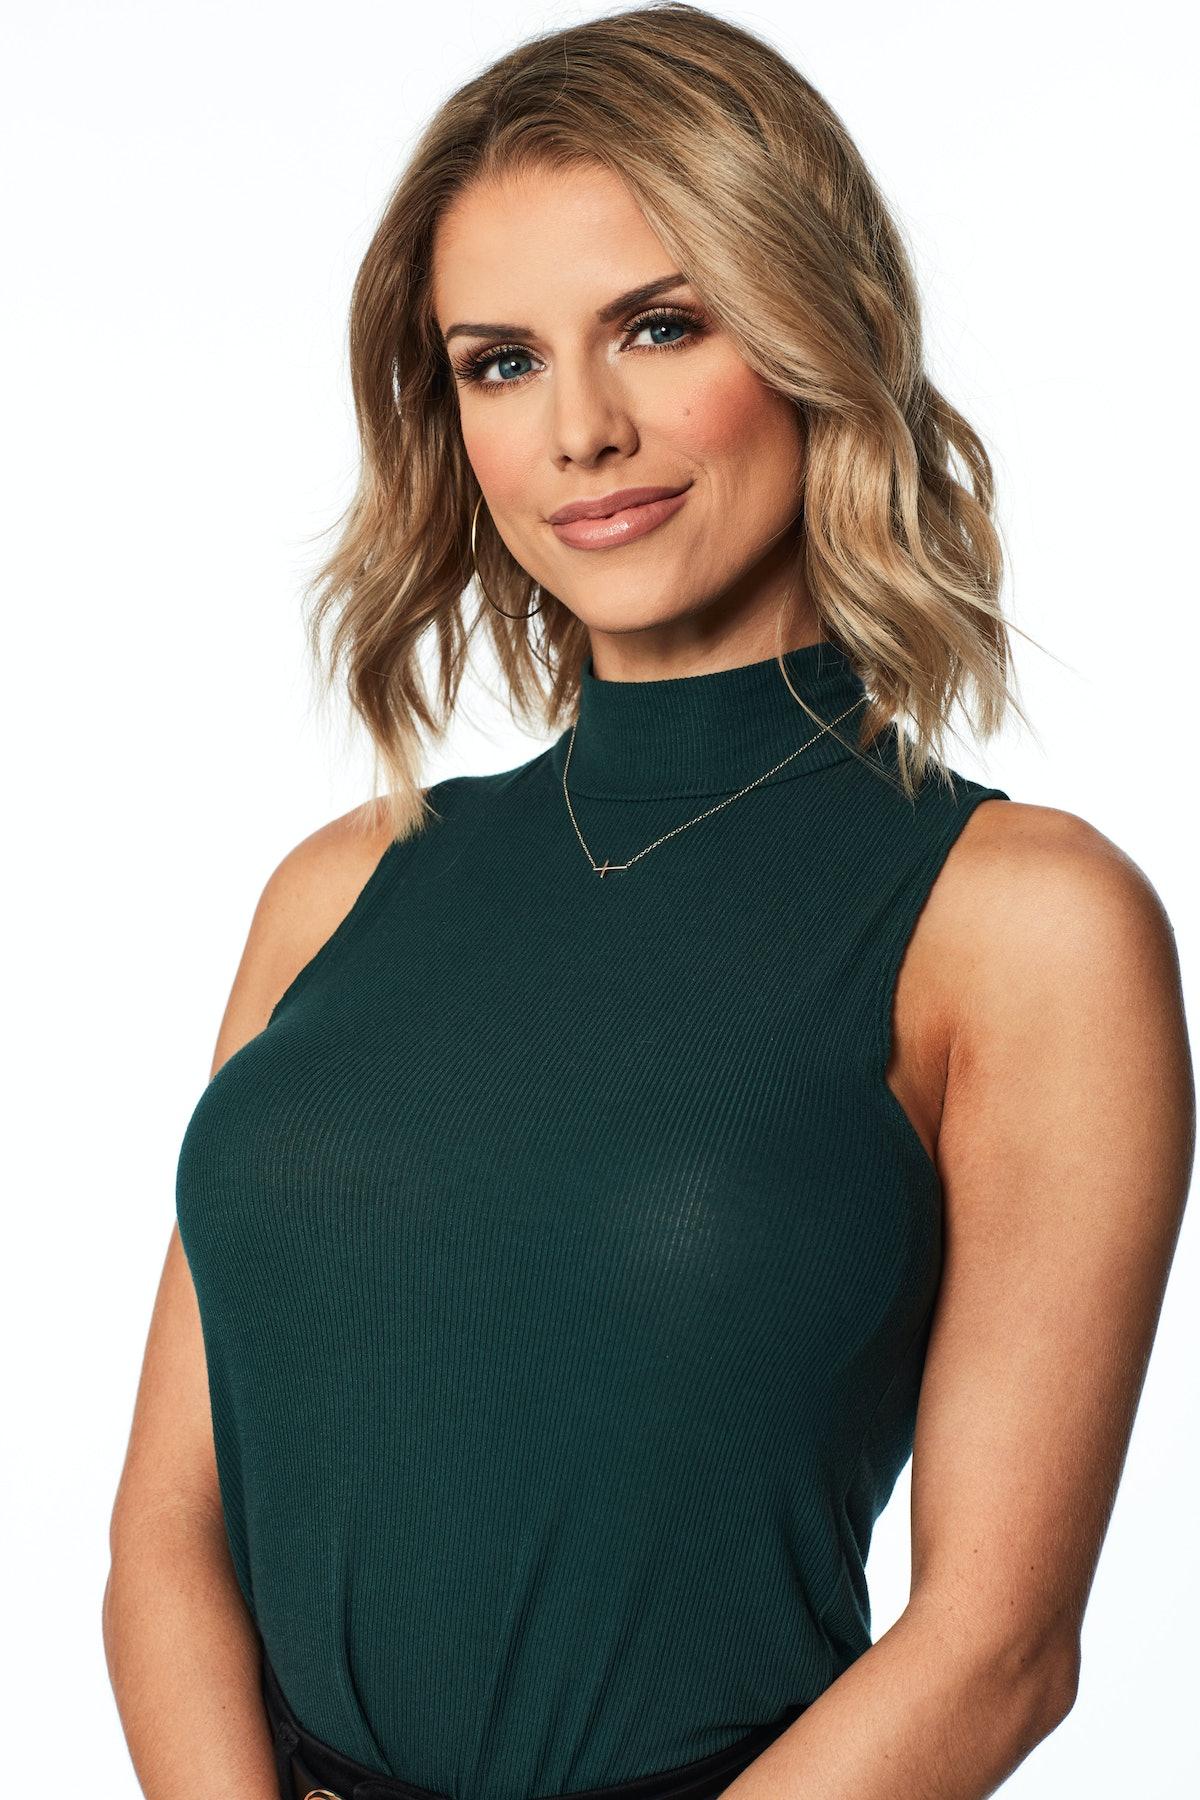 Courtney on 'The Bachelor'